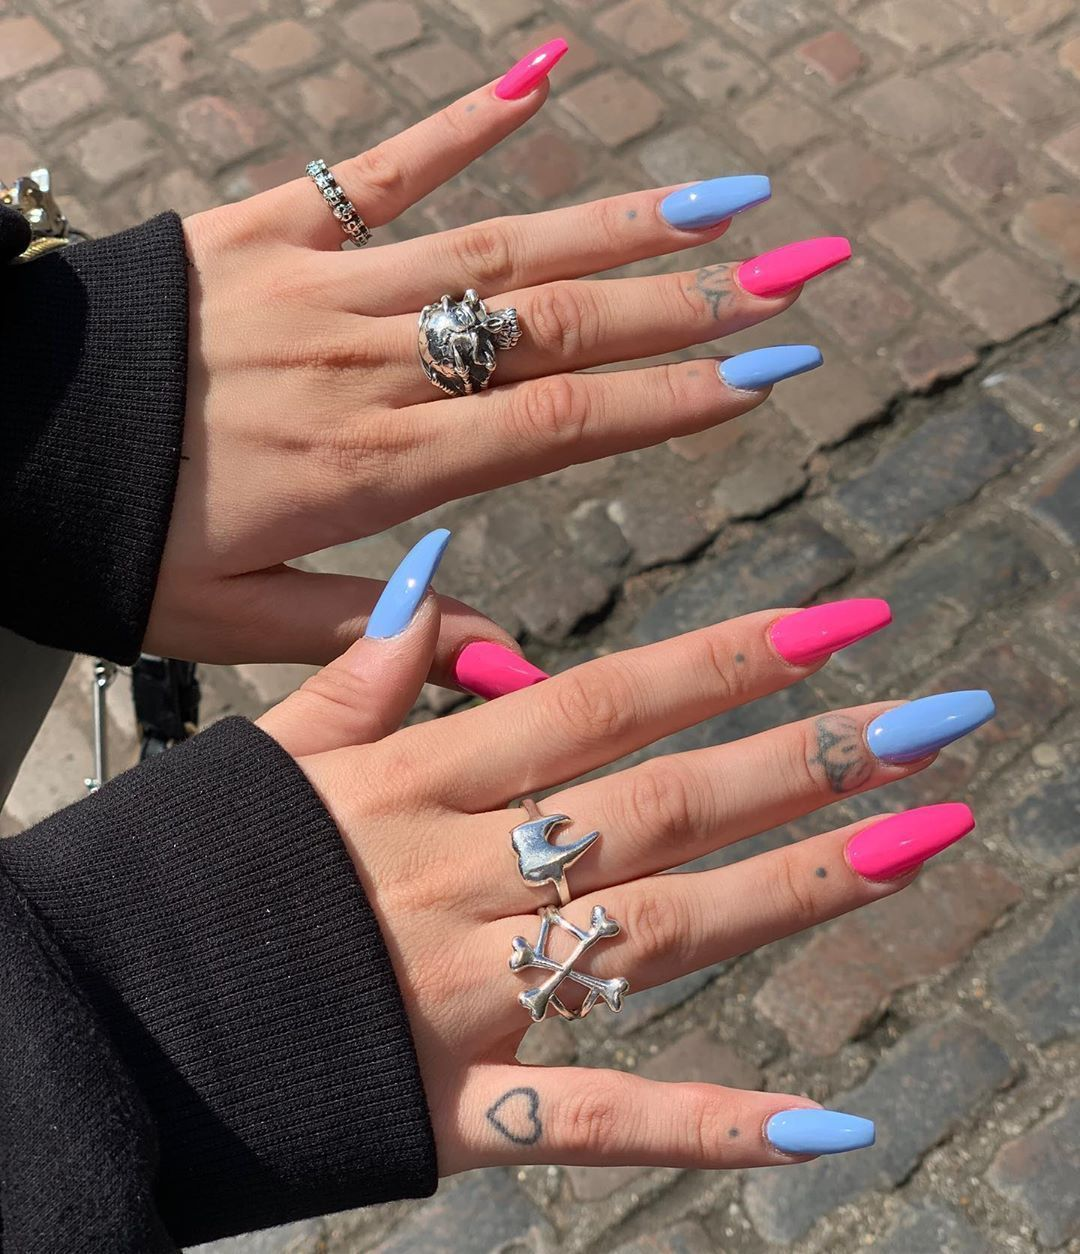 Nagel Acryl Blau Rosa #nailsofelpaso #acryilicnails #nailsofinstsgram #Herb ...